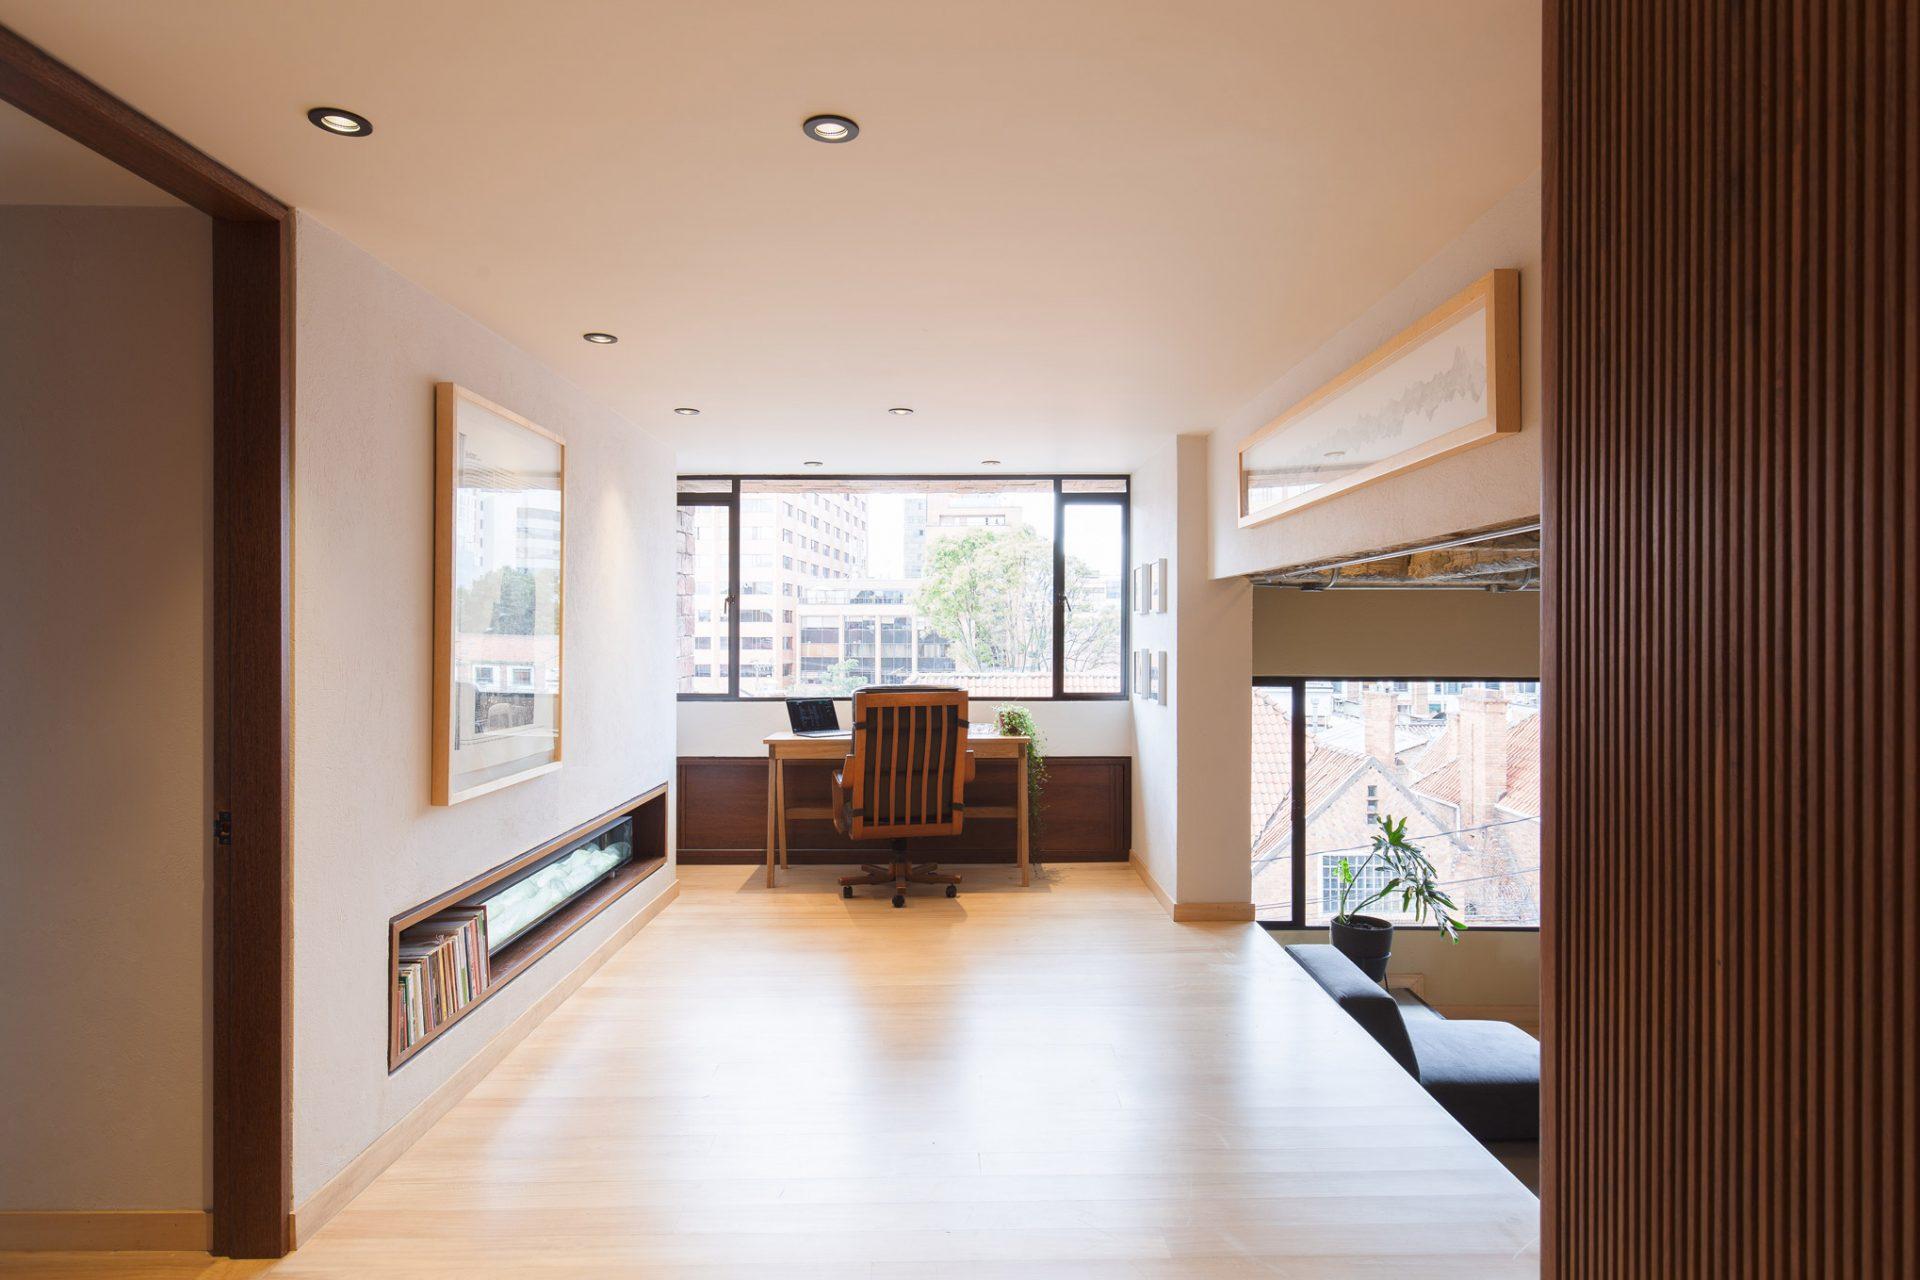 12.MLS_arquitectura_taller_tragaluz_interior_dutch_bogota_colombia_simon_bosch_photography